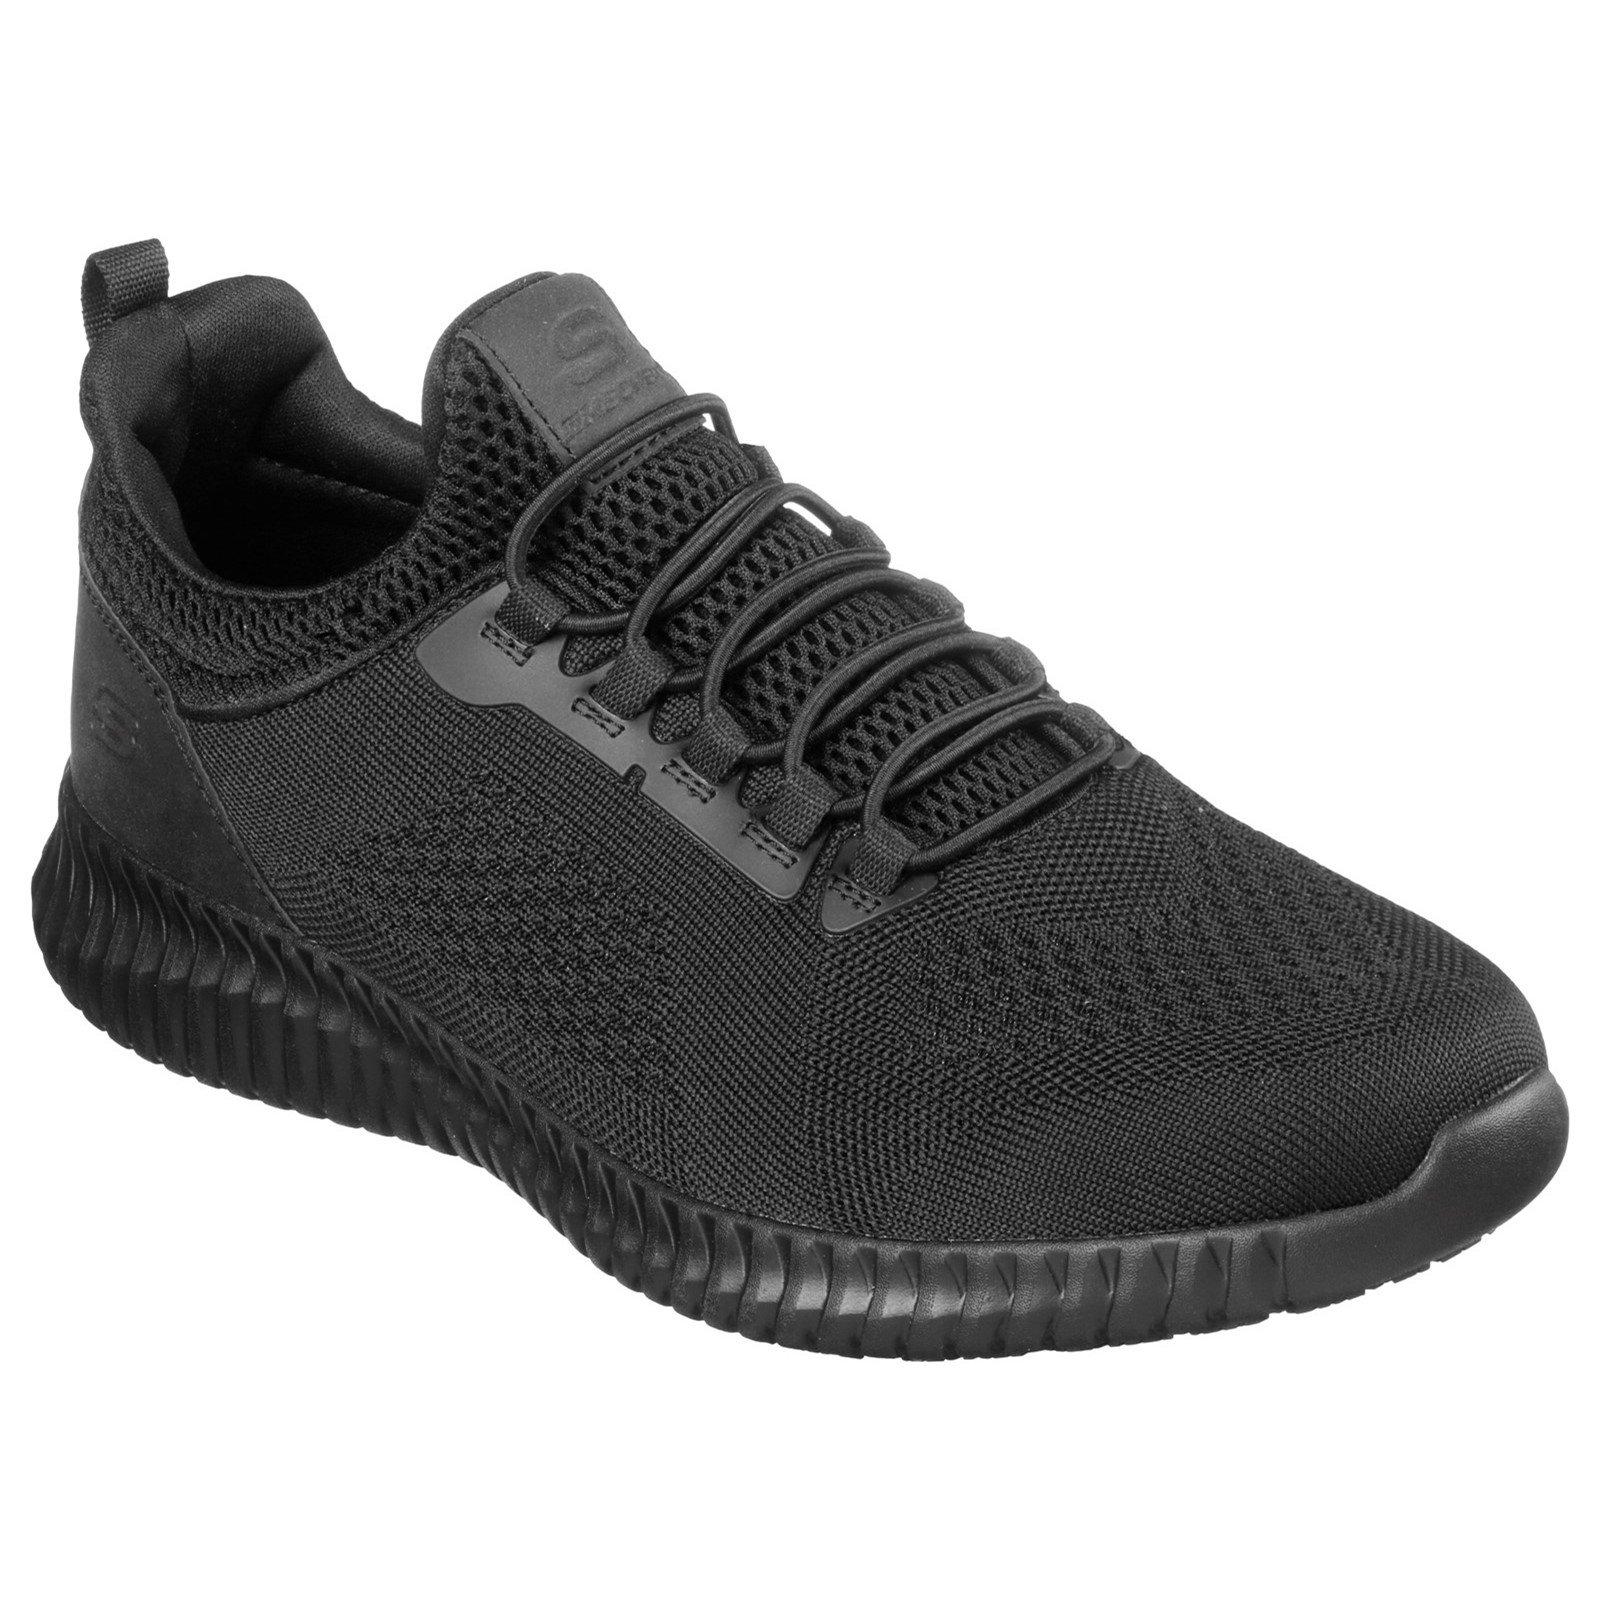 Skechers Unisex Cessnock Trainer Black 32620 - Black 11